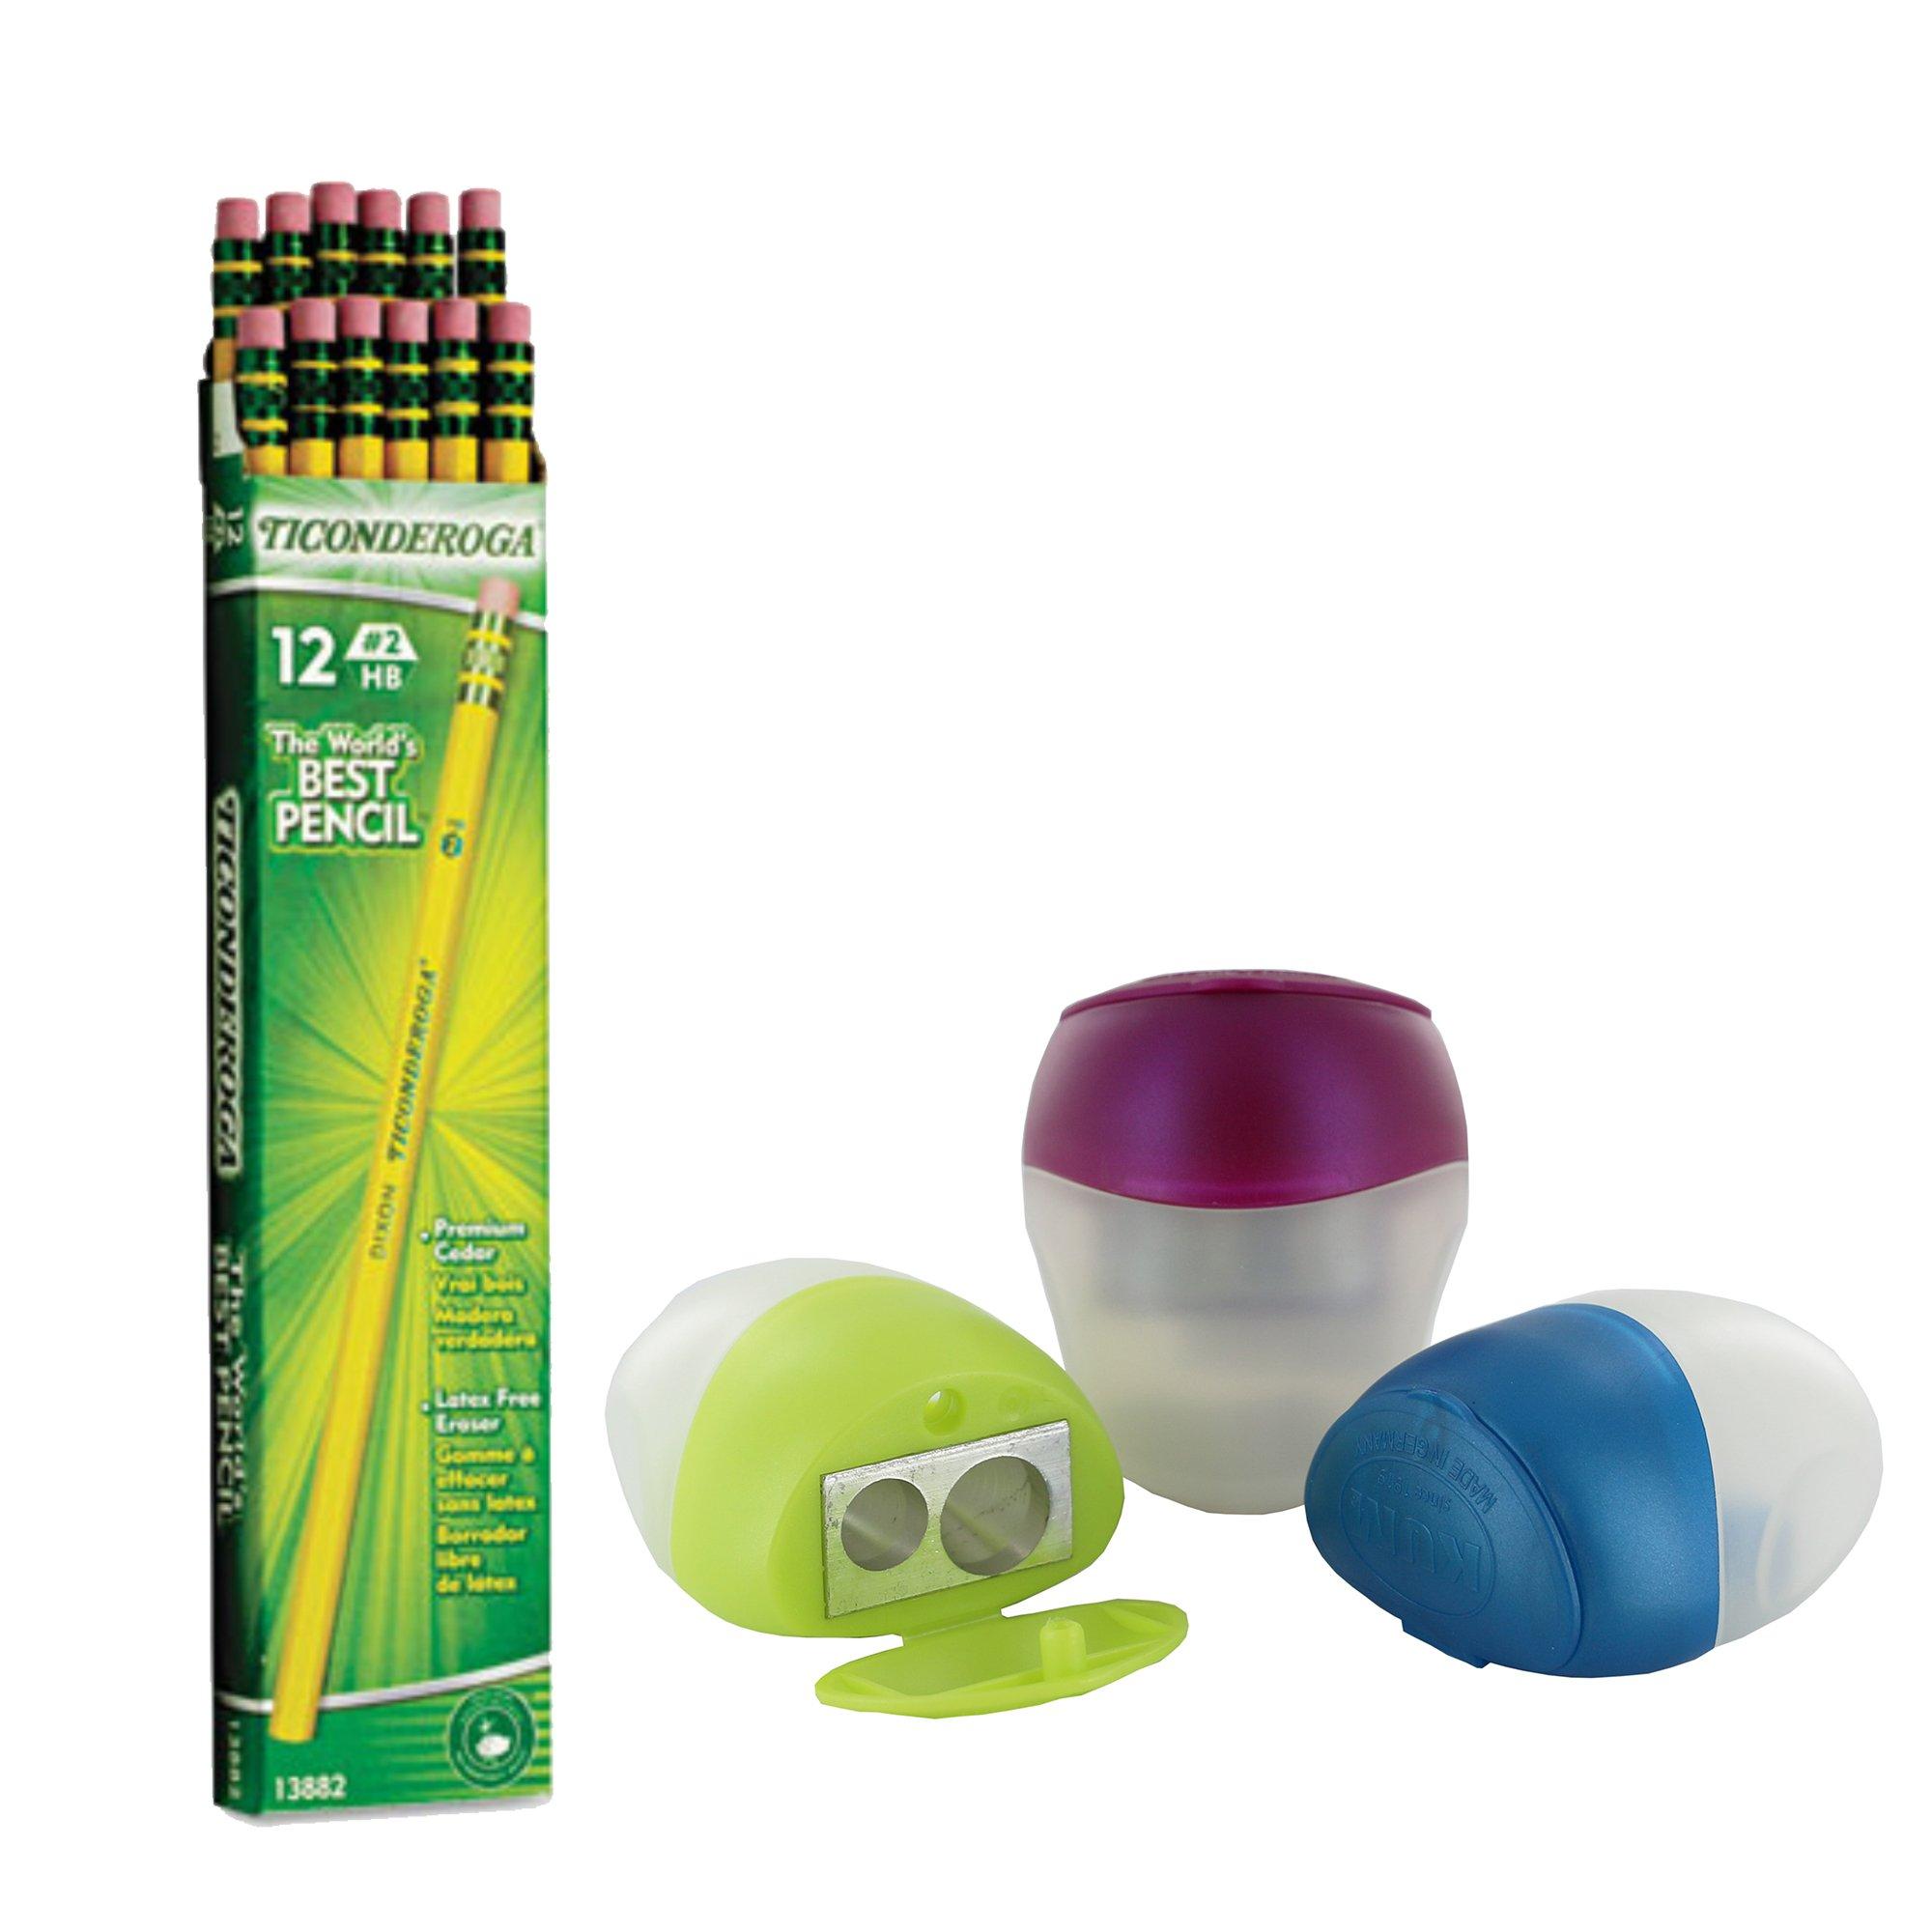 Dixon Ticonderoga Wood-Cased Pencils, 2 HB, Yellow, Box of 12, Including FREE BONUS Double Hole Pencils Sharpener (Metalic Colors - may vary)